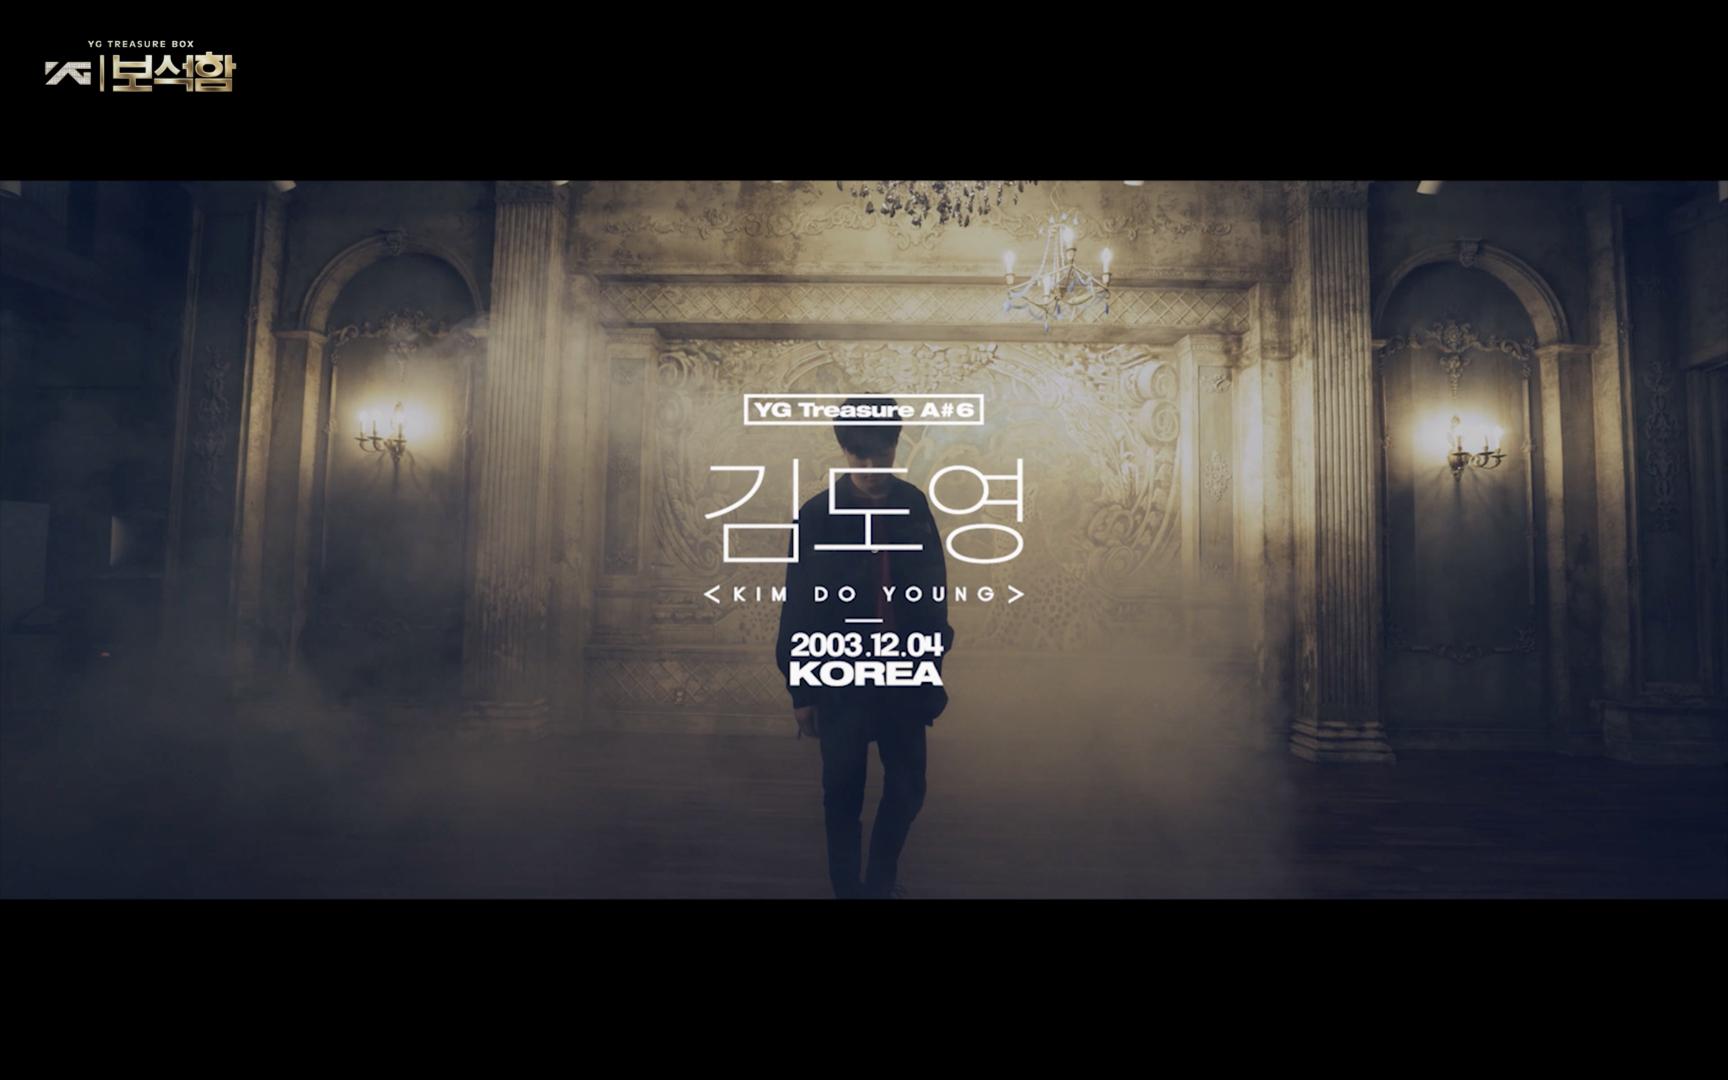 YG보석함ㅣA#6 김도영 <KIM DOYOUNG> #인터뷰+퍼포먼스